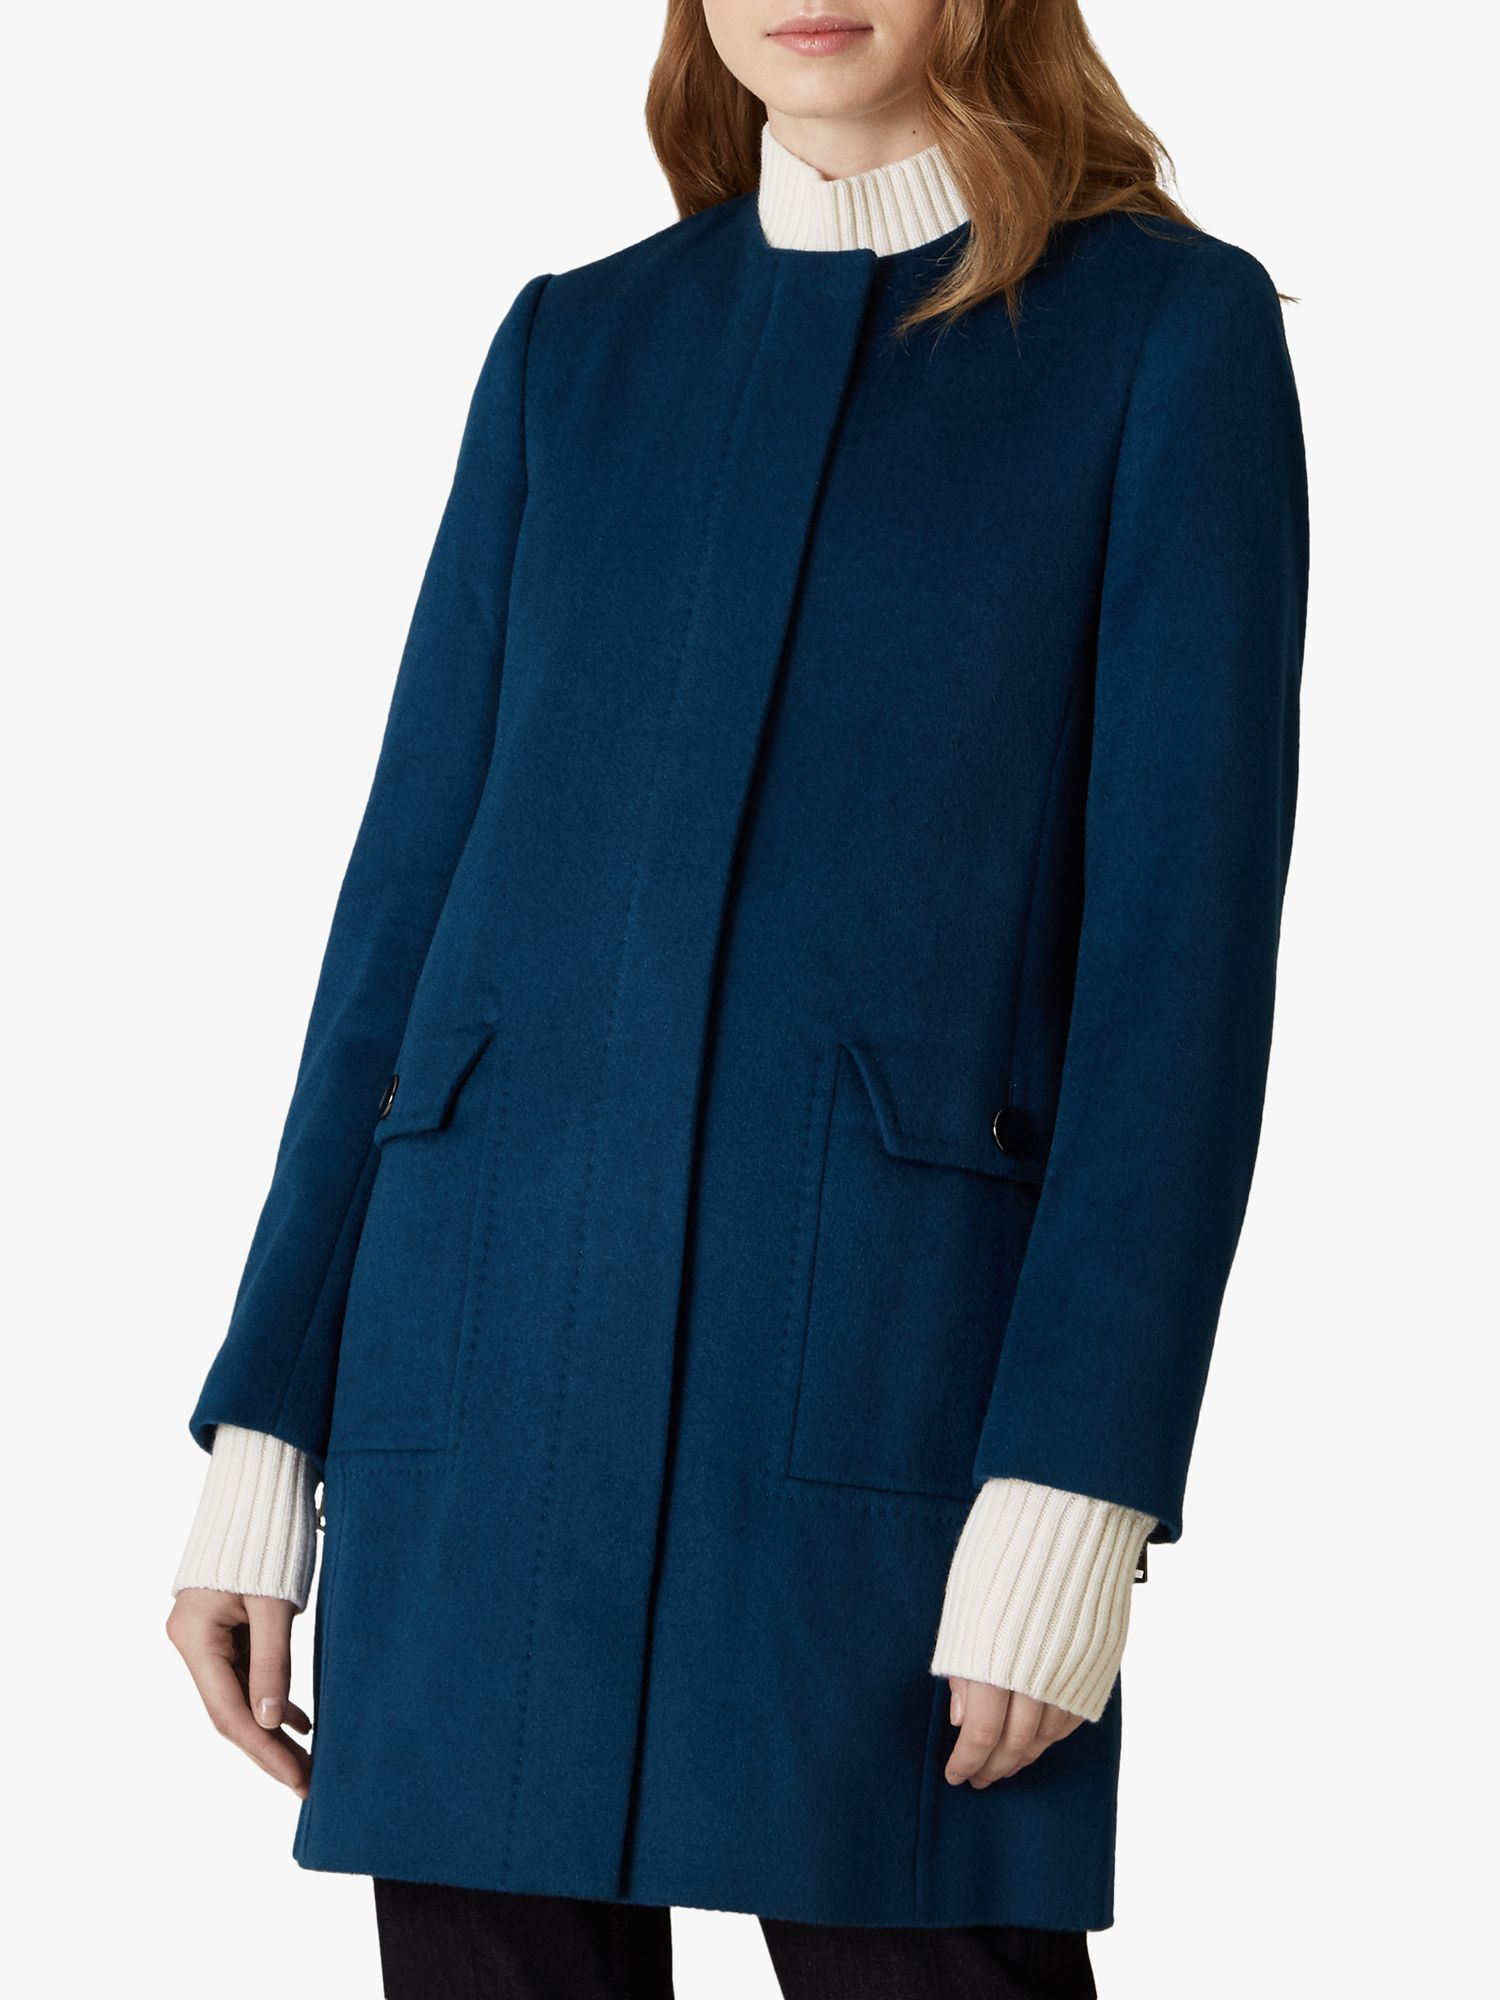 Jaeger Jaeger Wool Collarless Coat